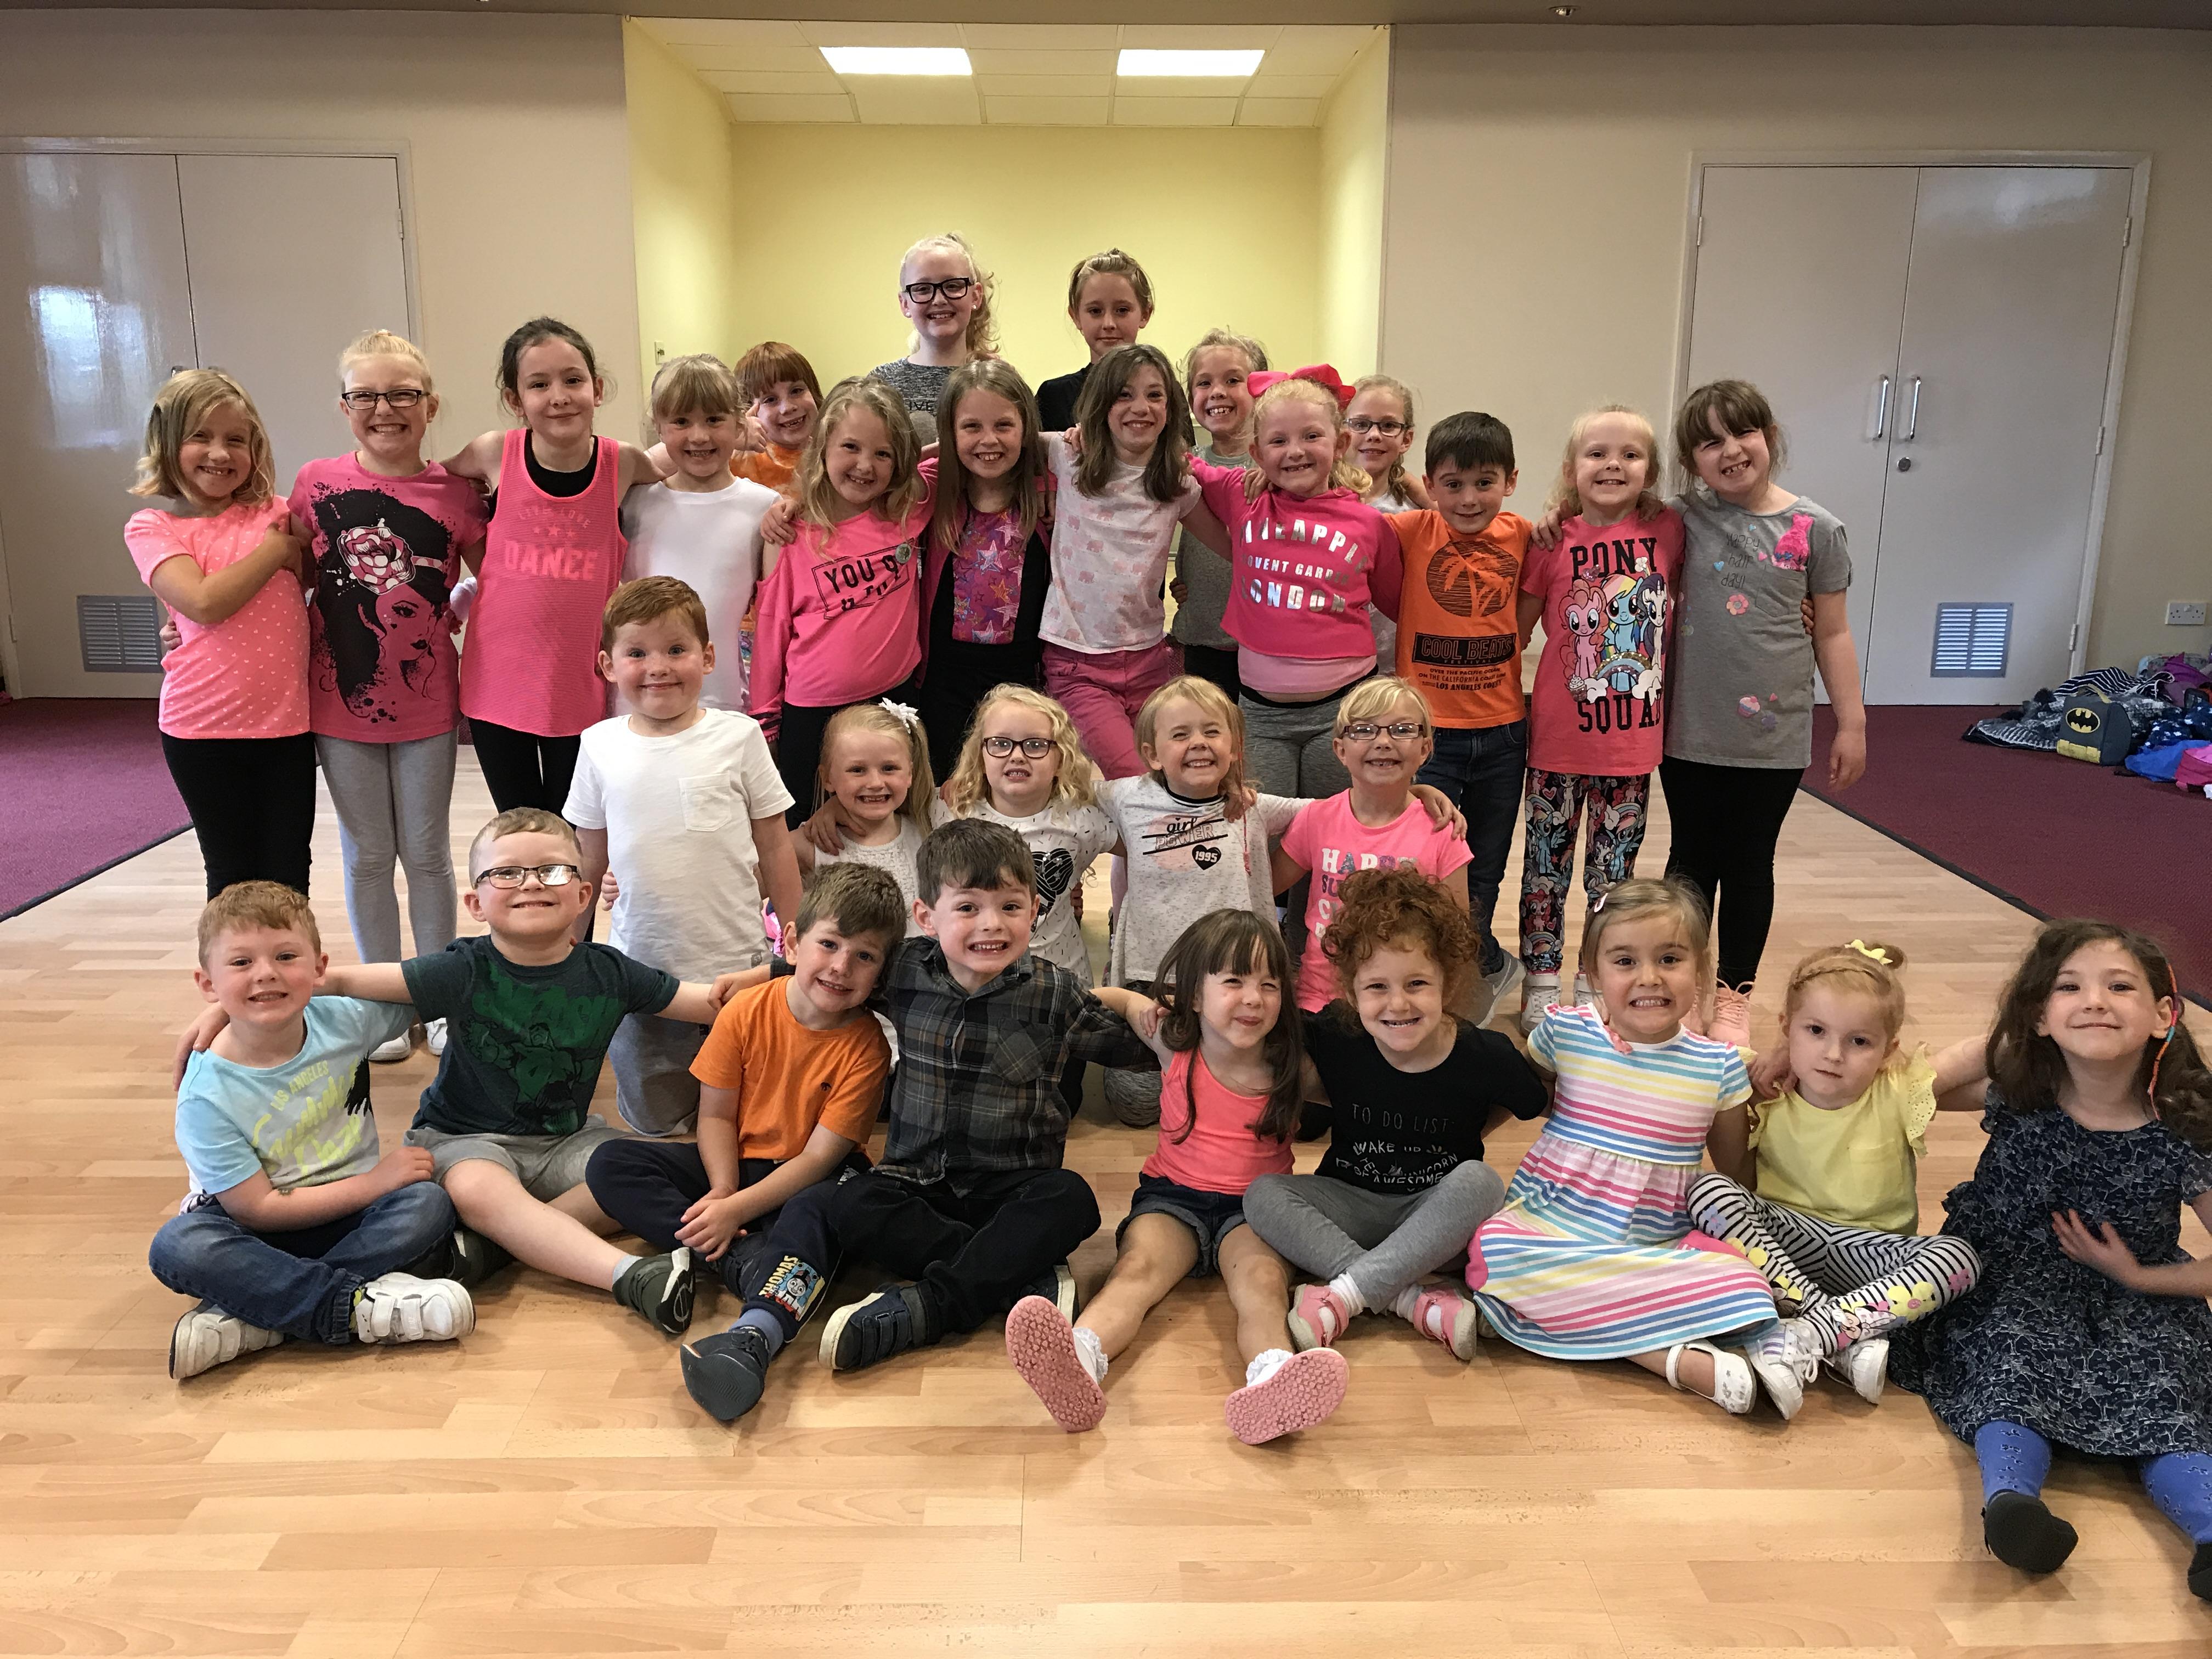 Anna's Dance - Princess Workshop August 2017